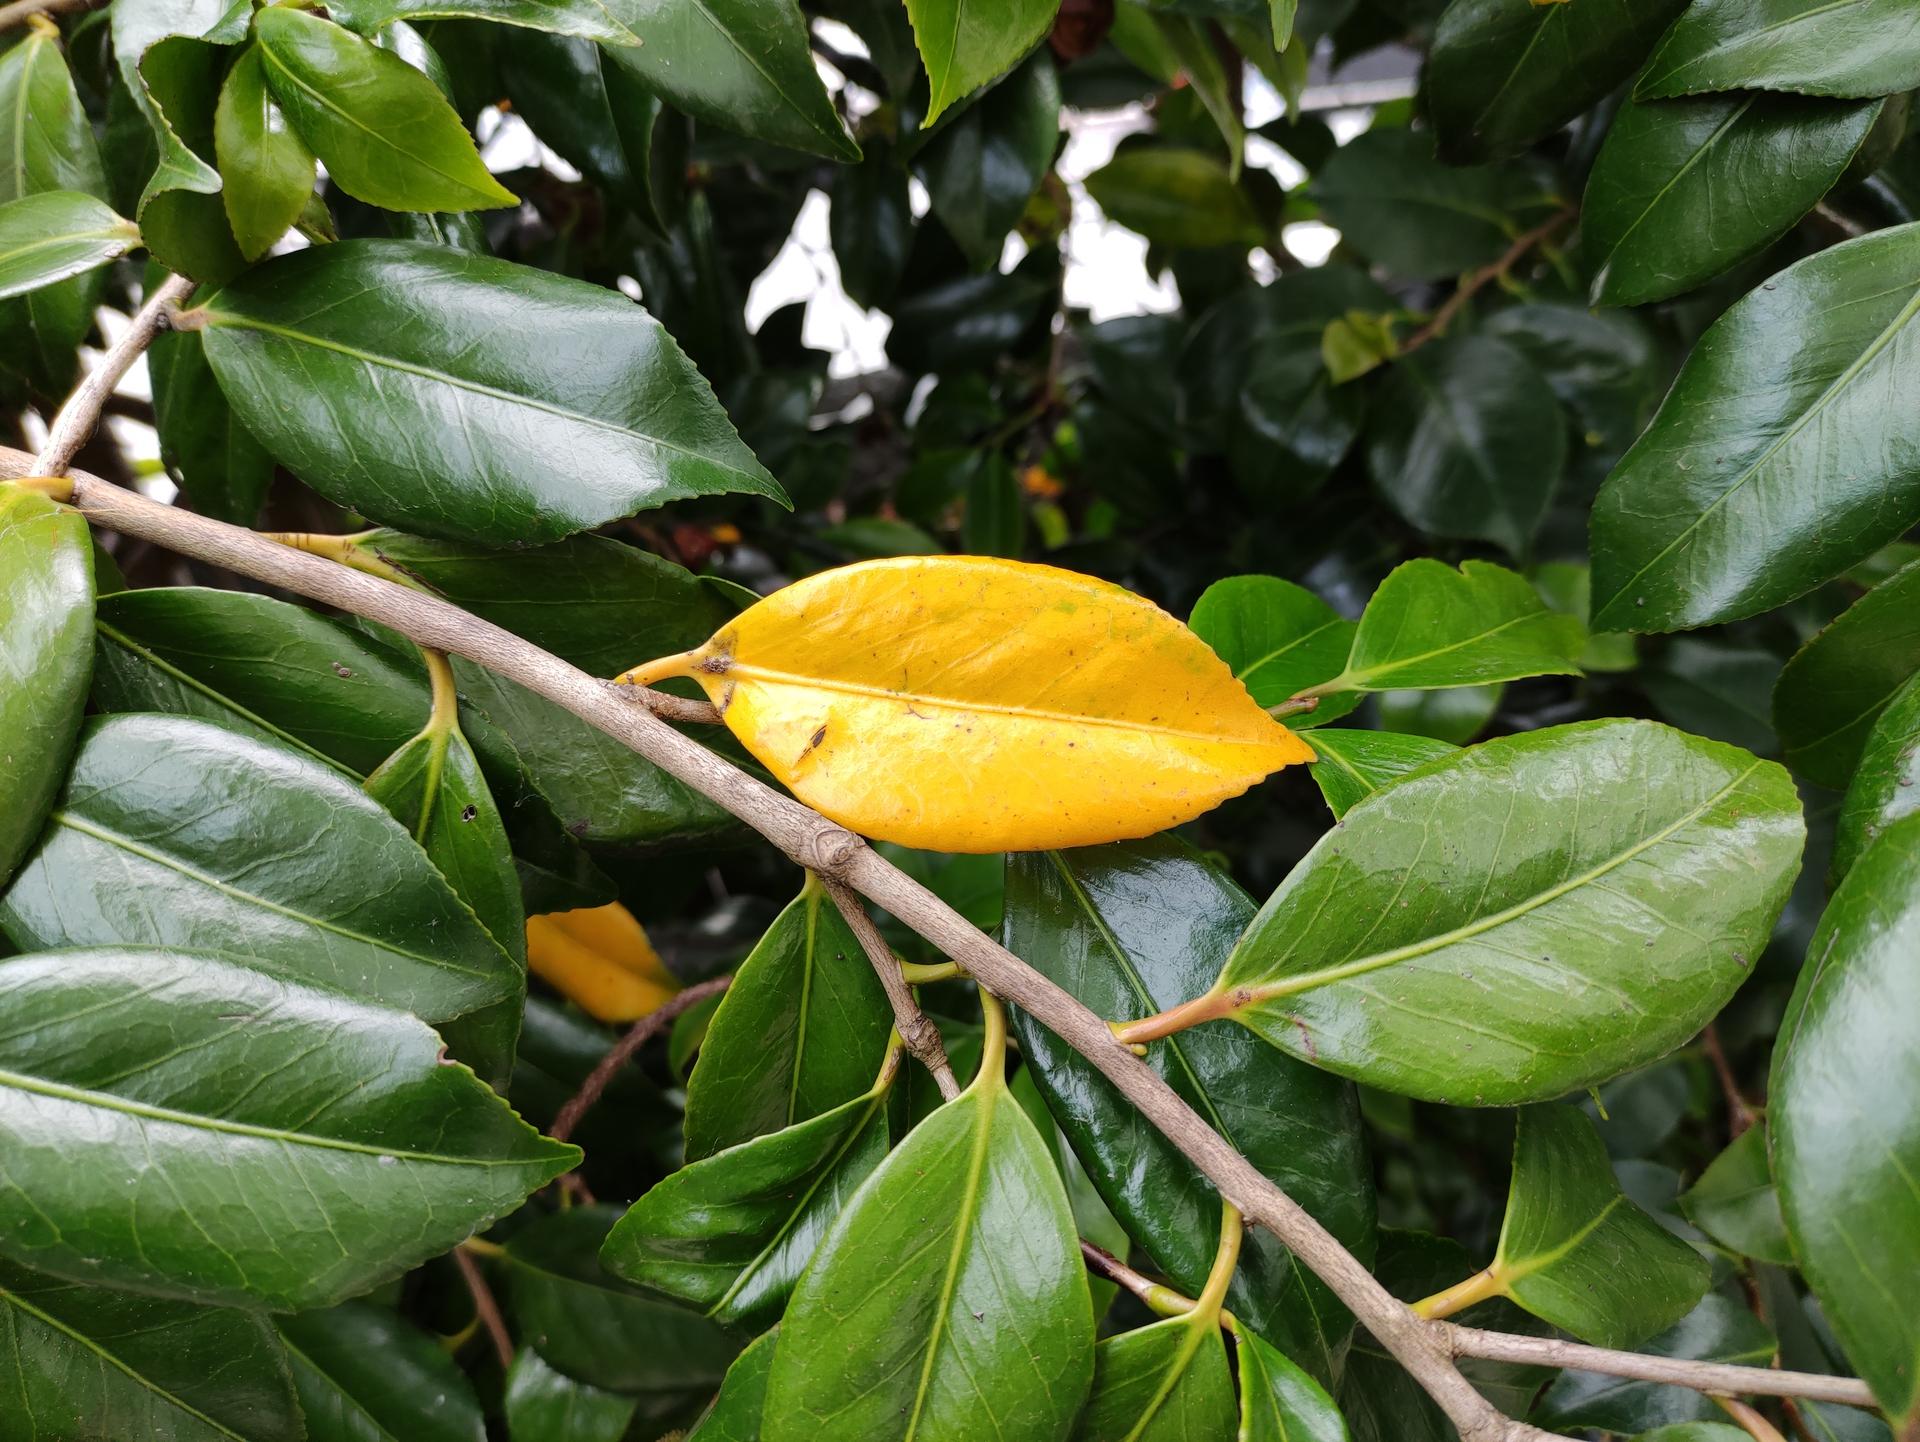 Poco F2 Pro camera test Color test of a standout leaf